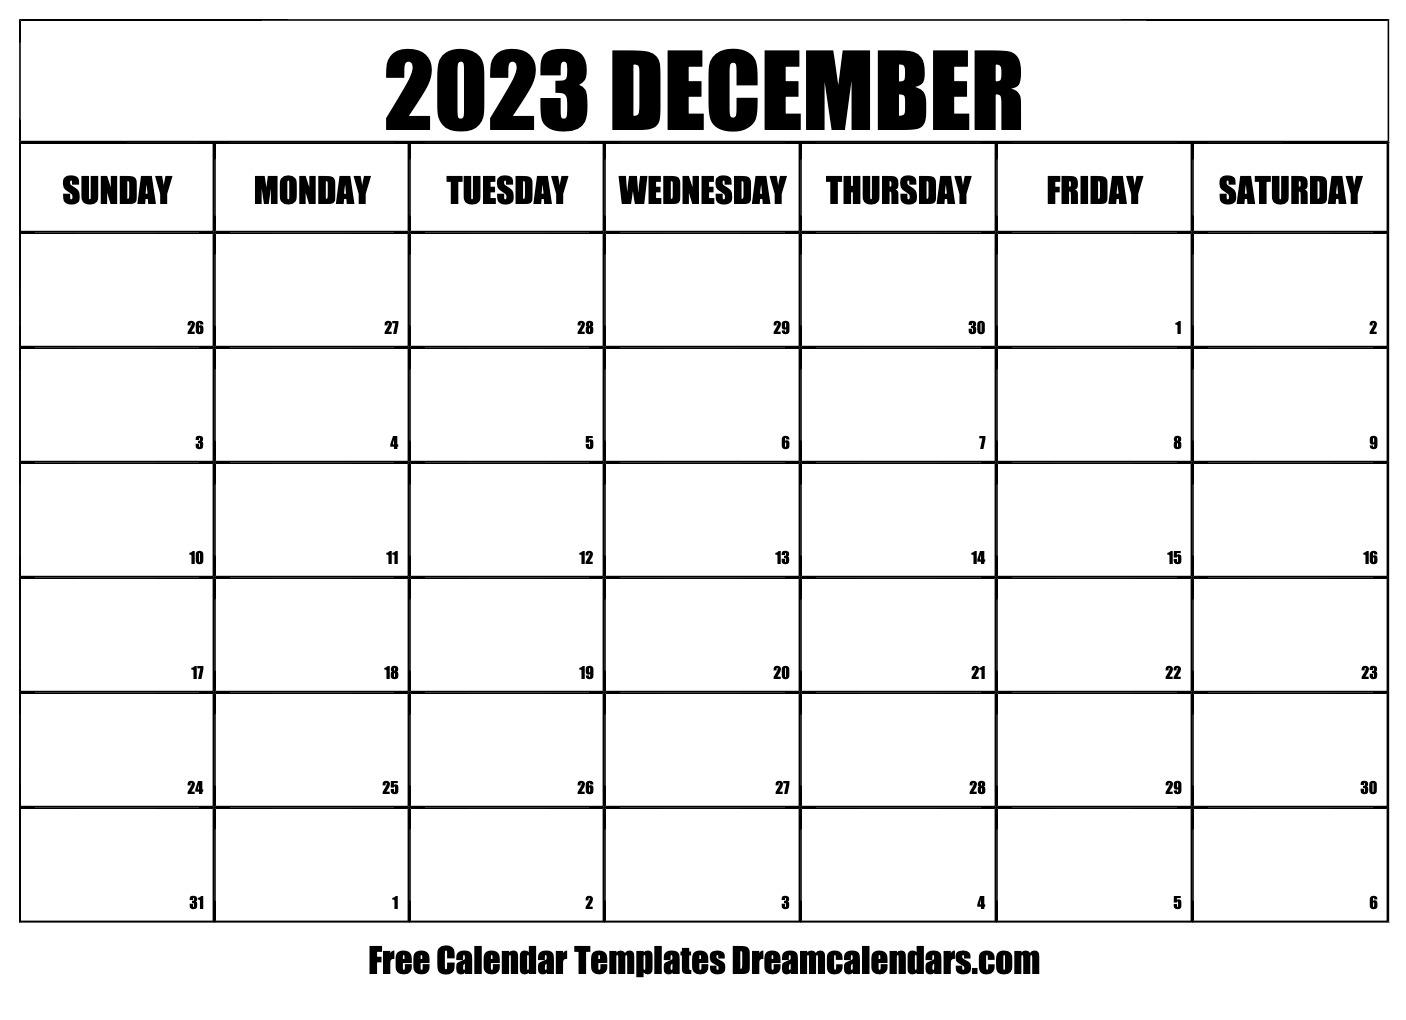 Calendar December 2023 January 2022.December 2023 Calendar Free Blank Printable Templates